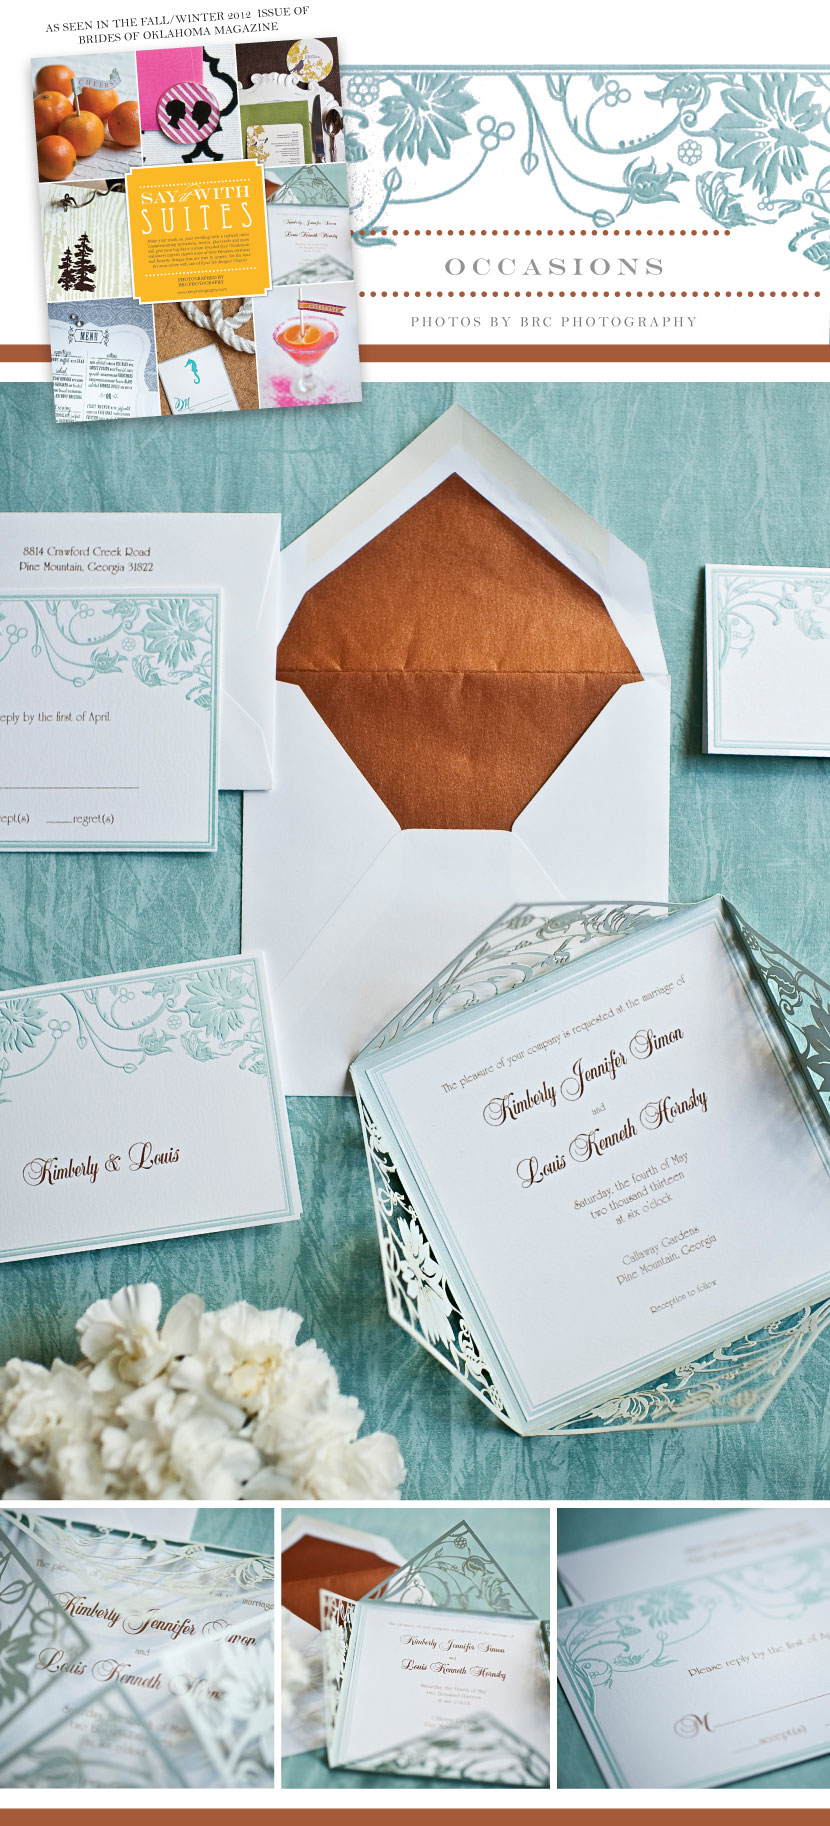 invitationblog_occasions